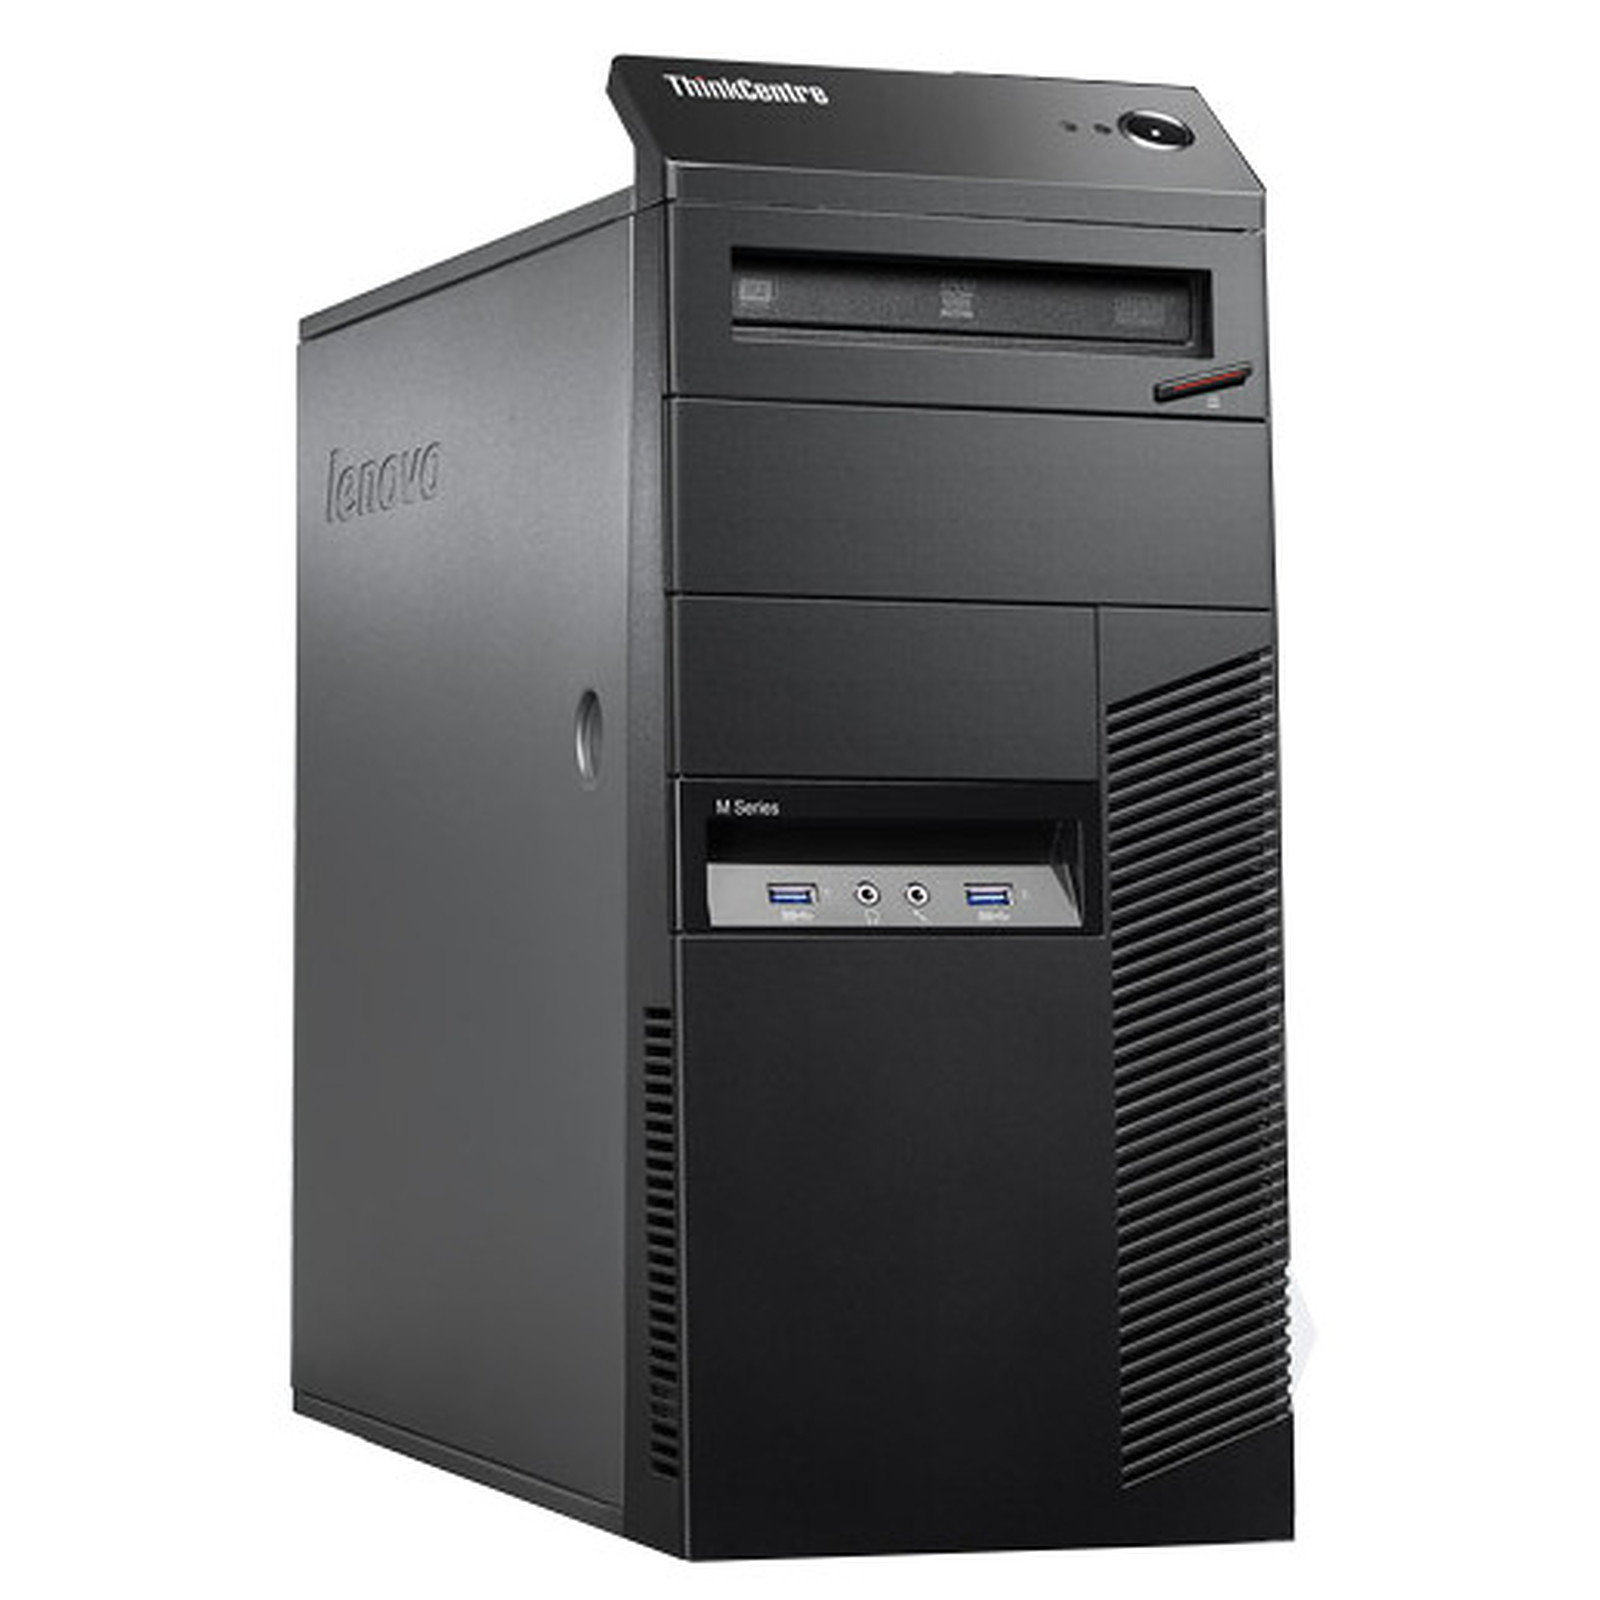 Lenovo ThinkCentre M83 (10BE001BFR)